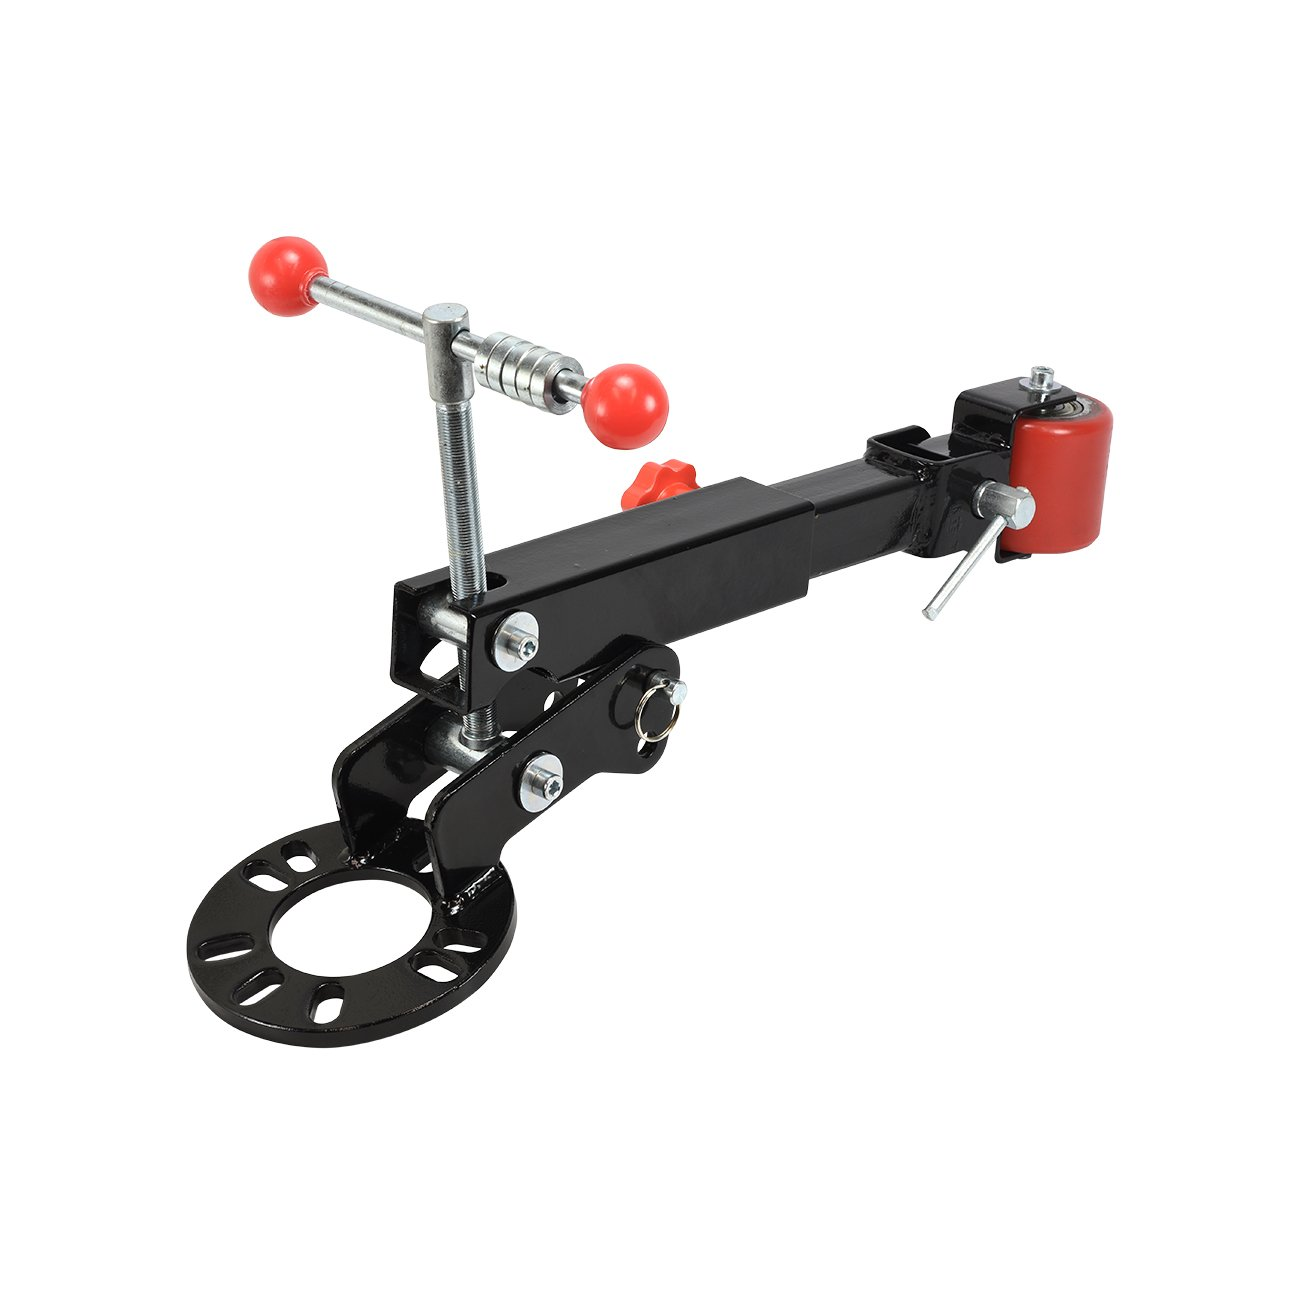 Hiltex 20767L Steel Fender Rolling Tool | Locks on Wheel Mount Lugs | Wheel Arch Flaring, Forming, Extending